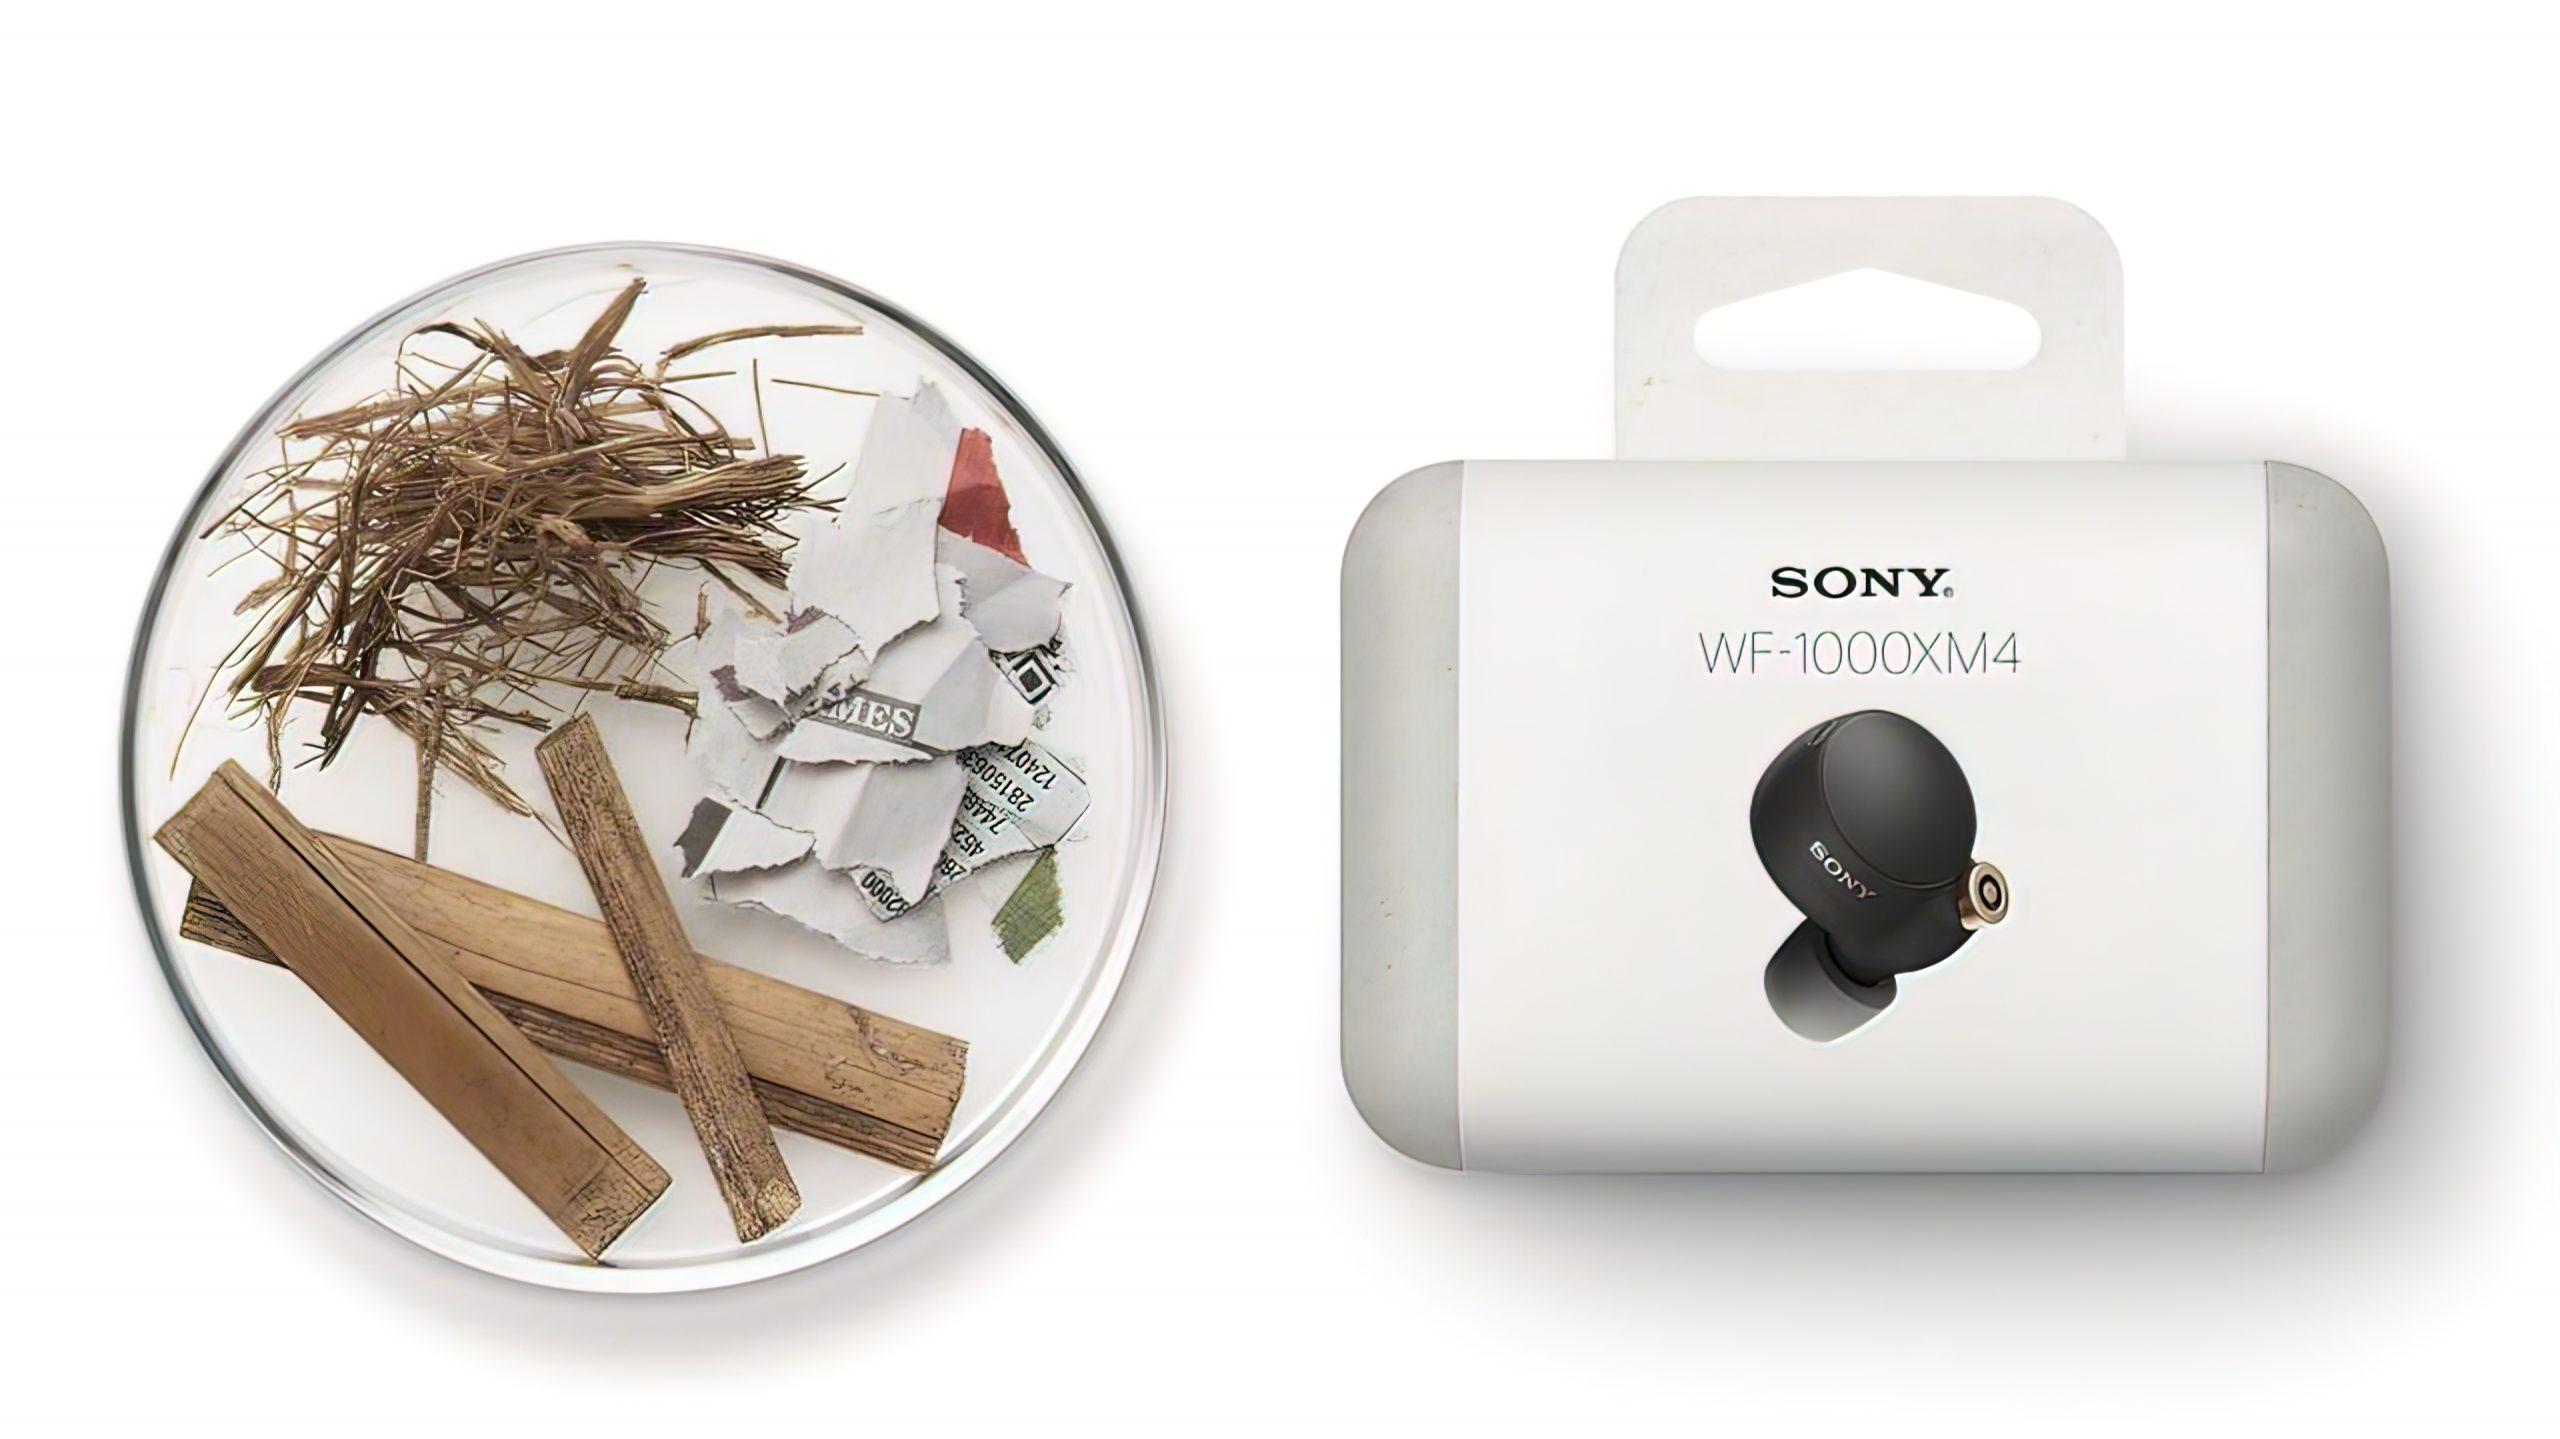 Sony WF-1000XM4 box